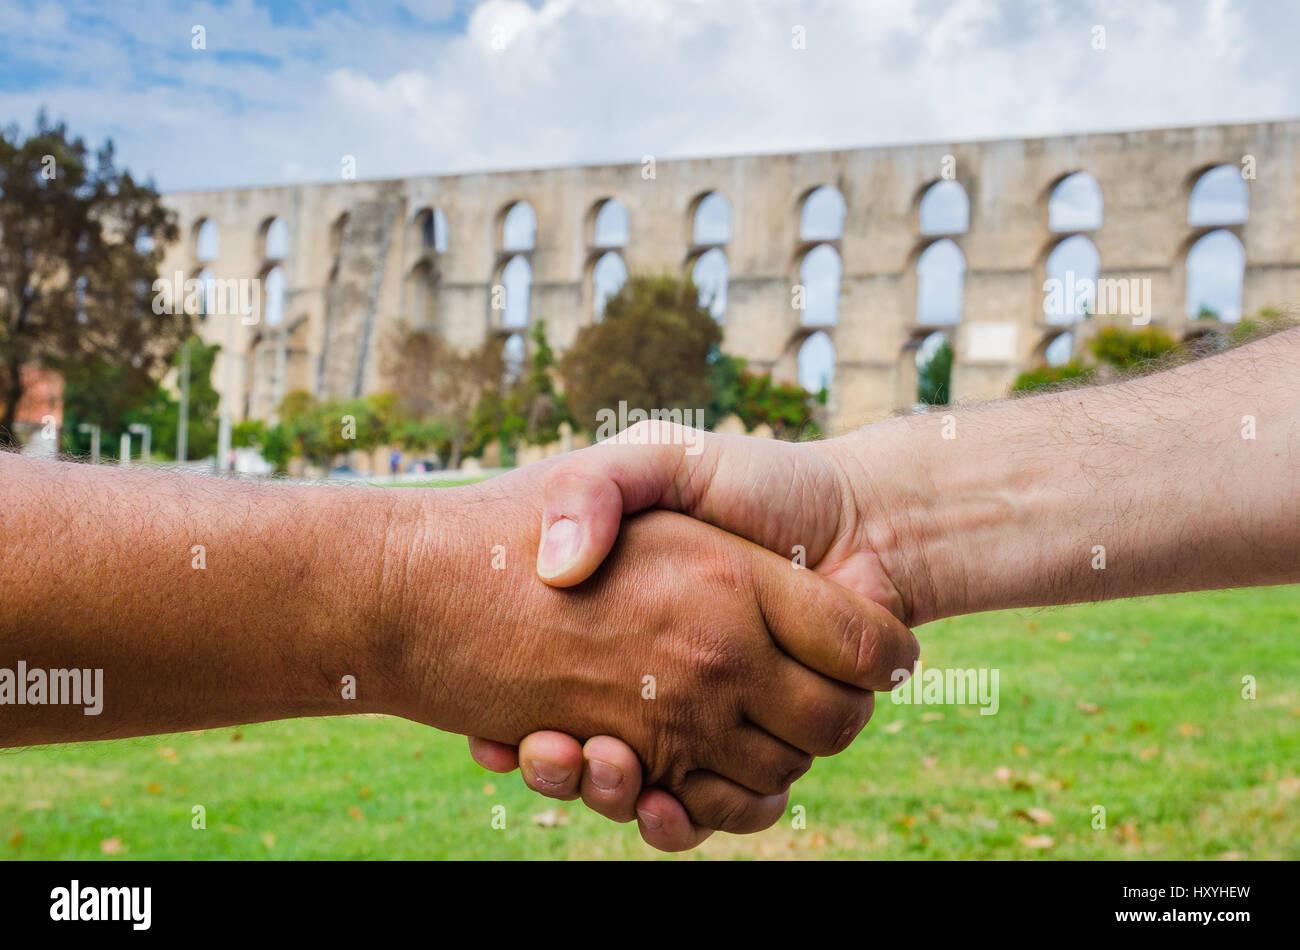 Closeup of people shaking hands. Amoreira Aqueduct in Town of Elvas Alentejo Region. Portugal, Europe - Stock Image